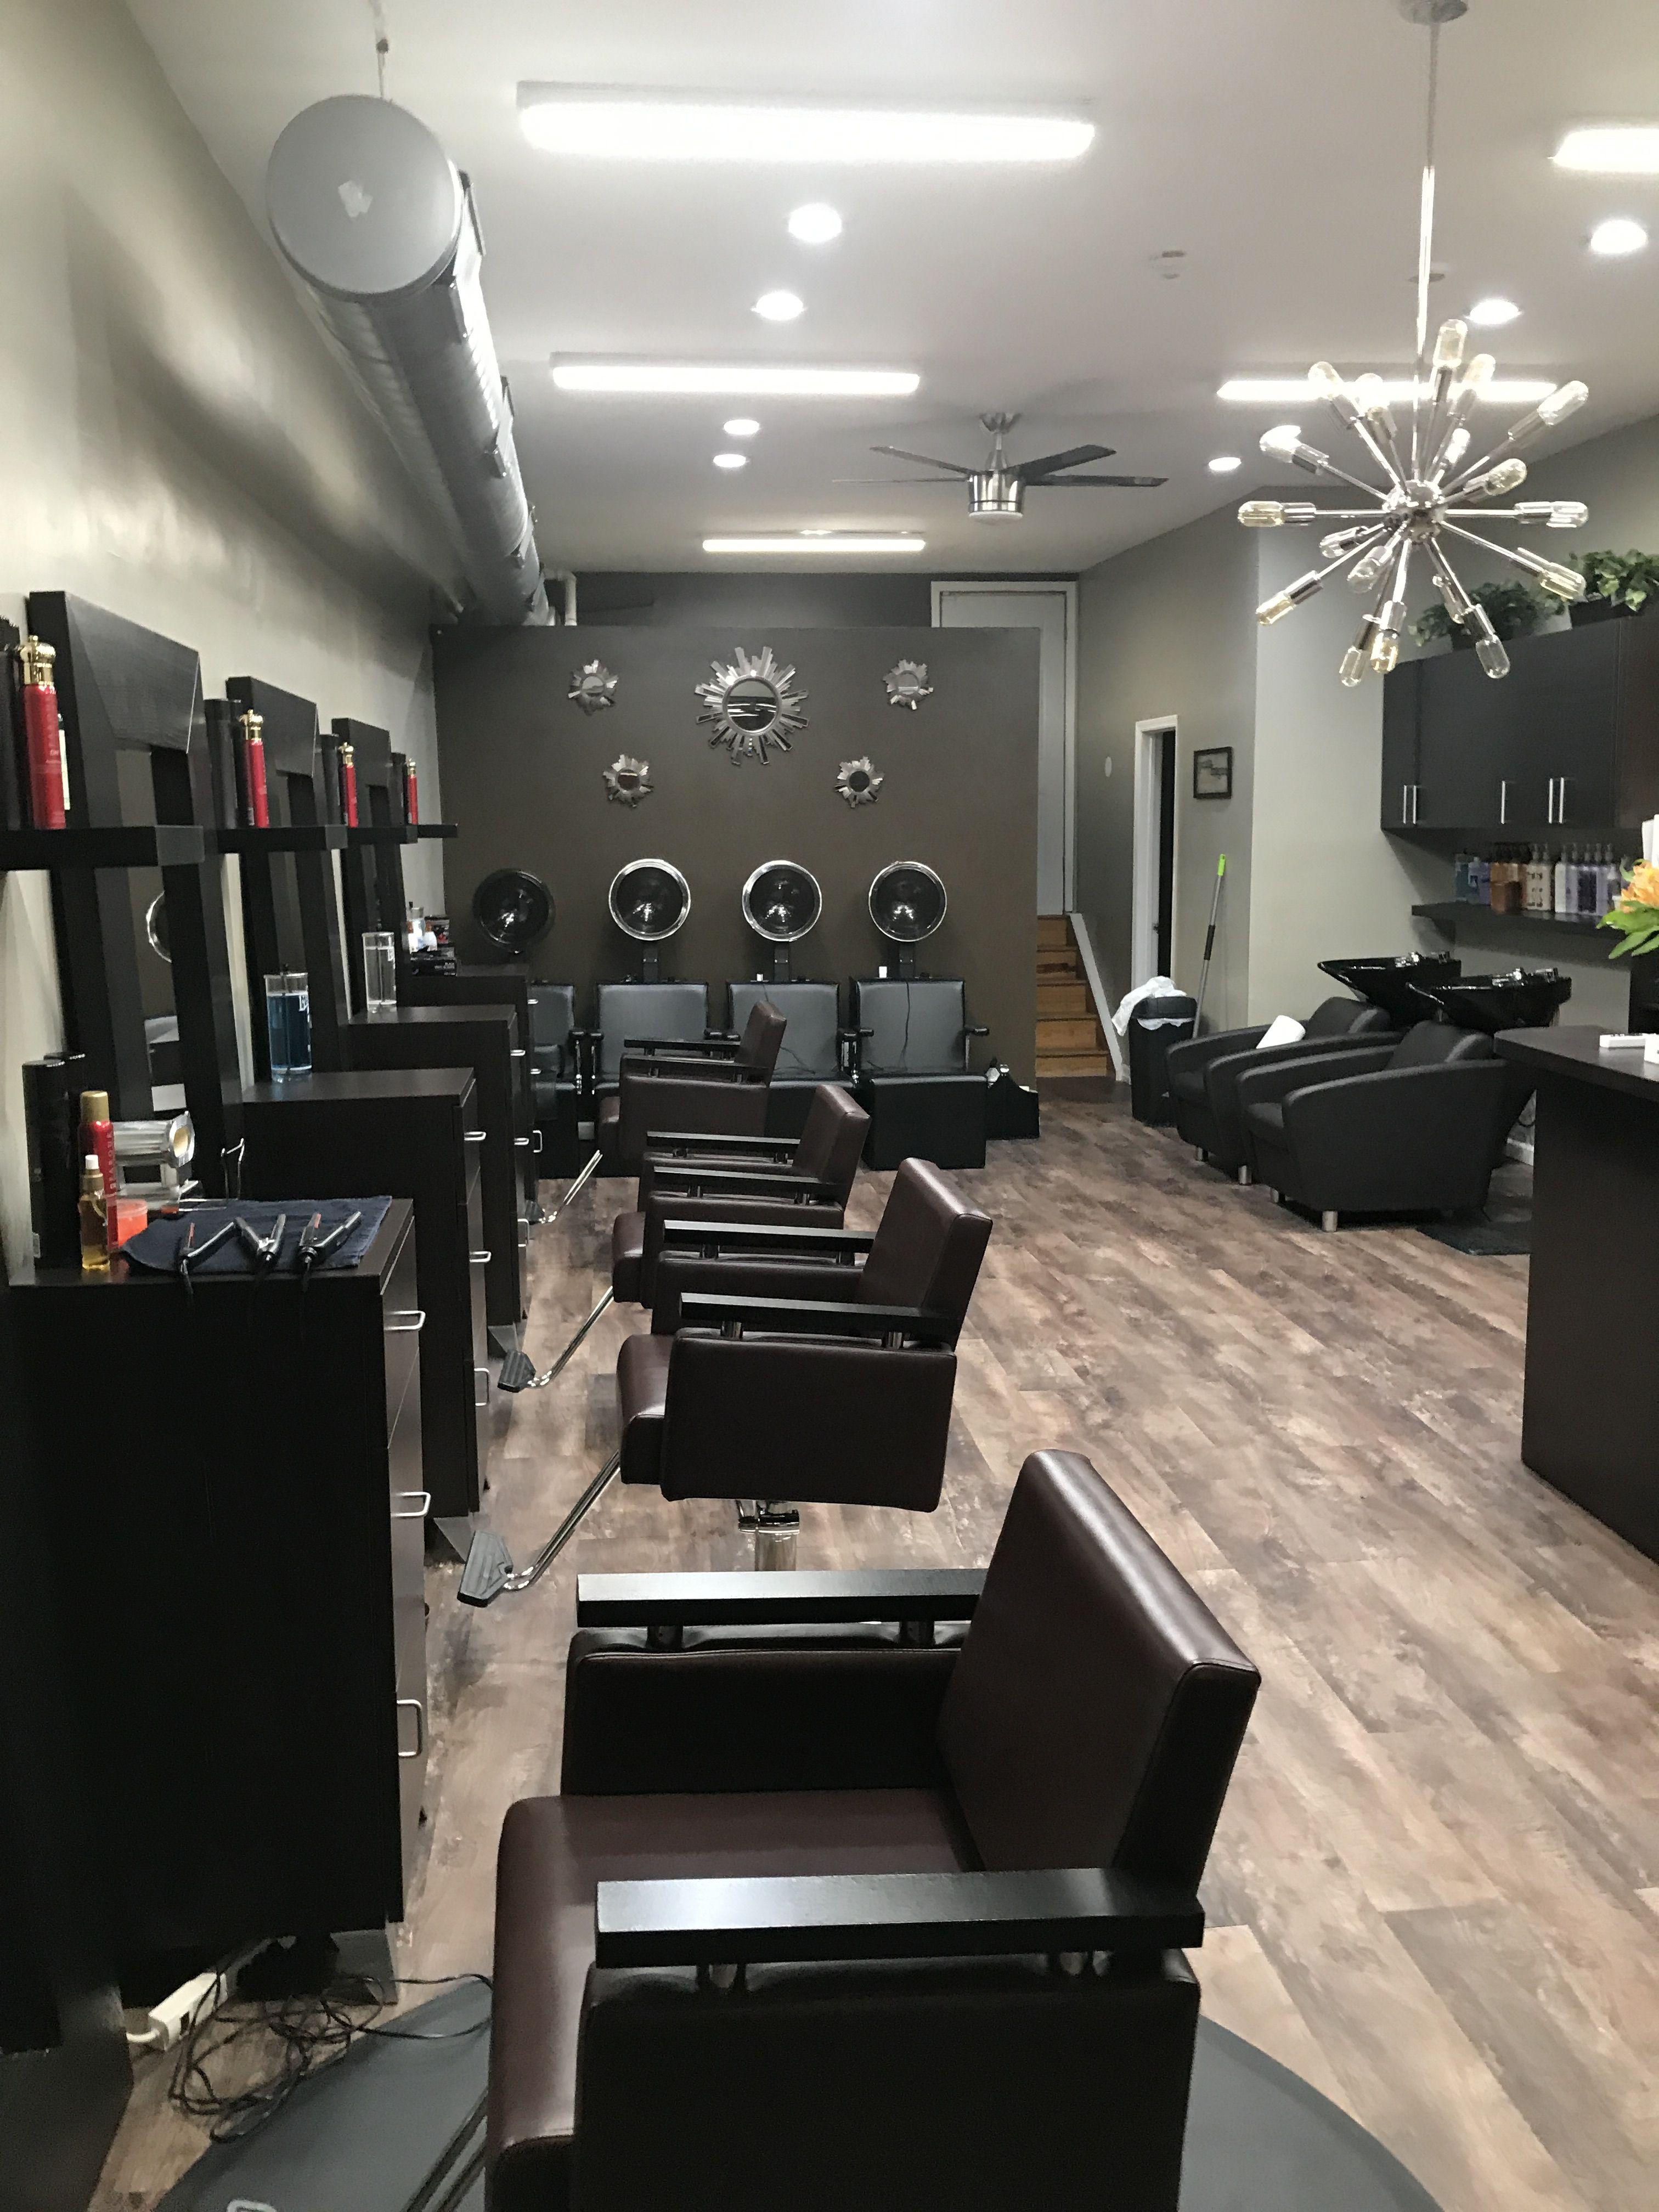 Studio 285 Myminerva In 2020 Salon Suites Decor Salon Interior Design Beauty Salon Decor